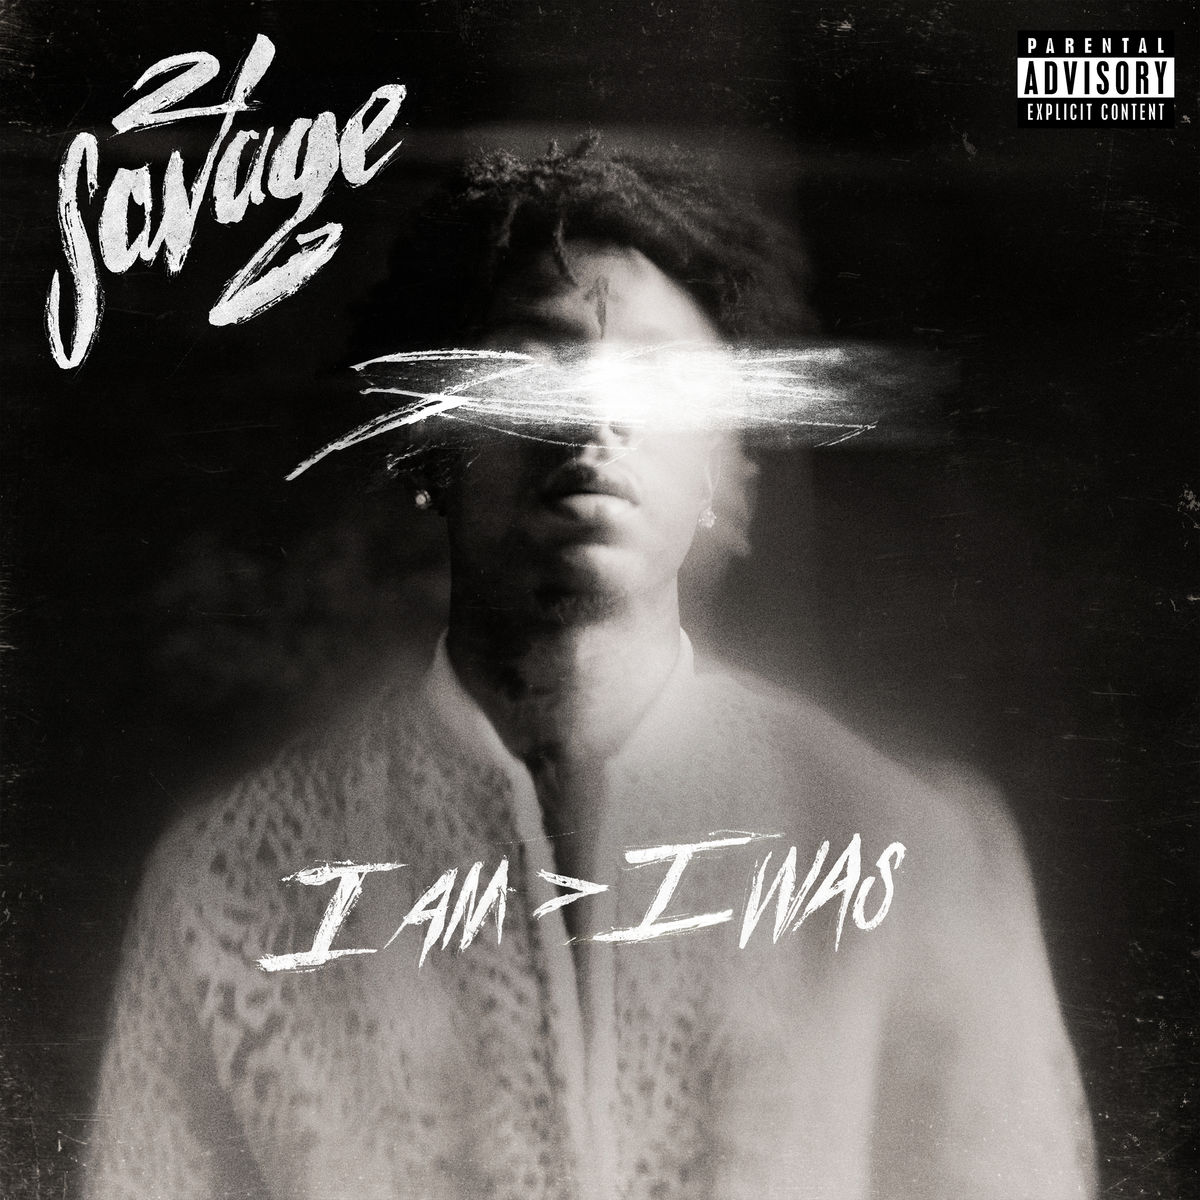 21 Savage - CD I Am > I Was